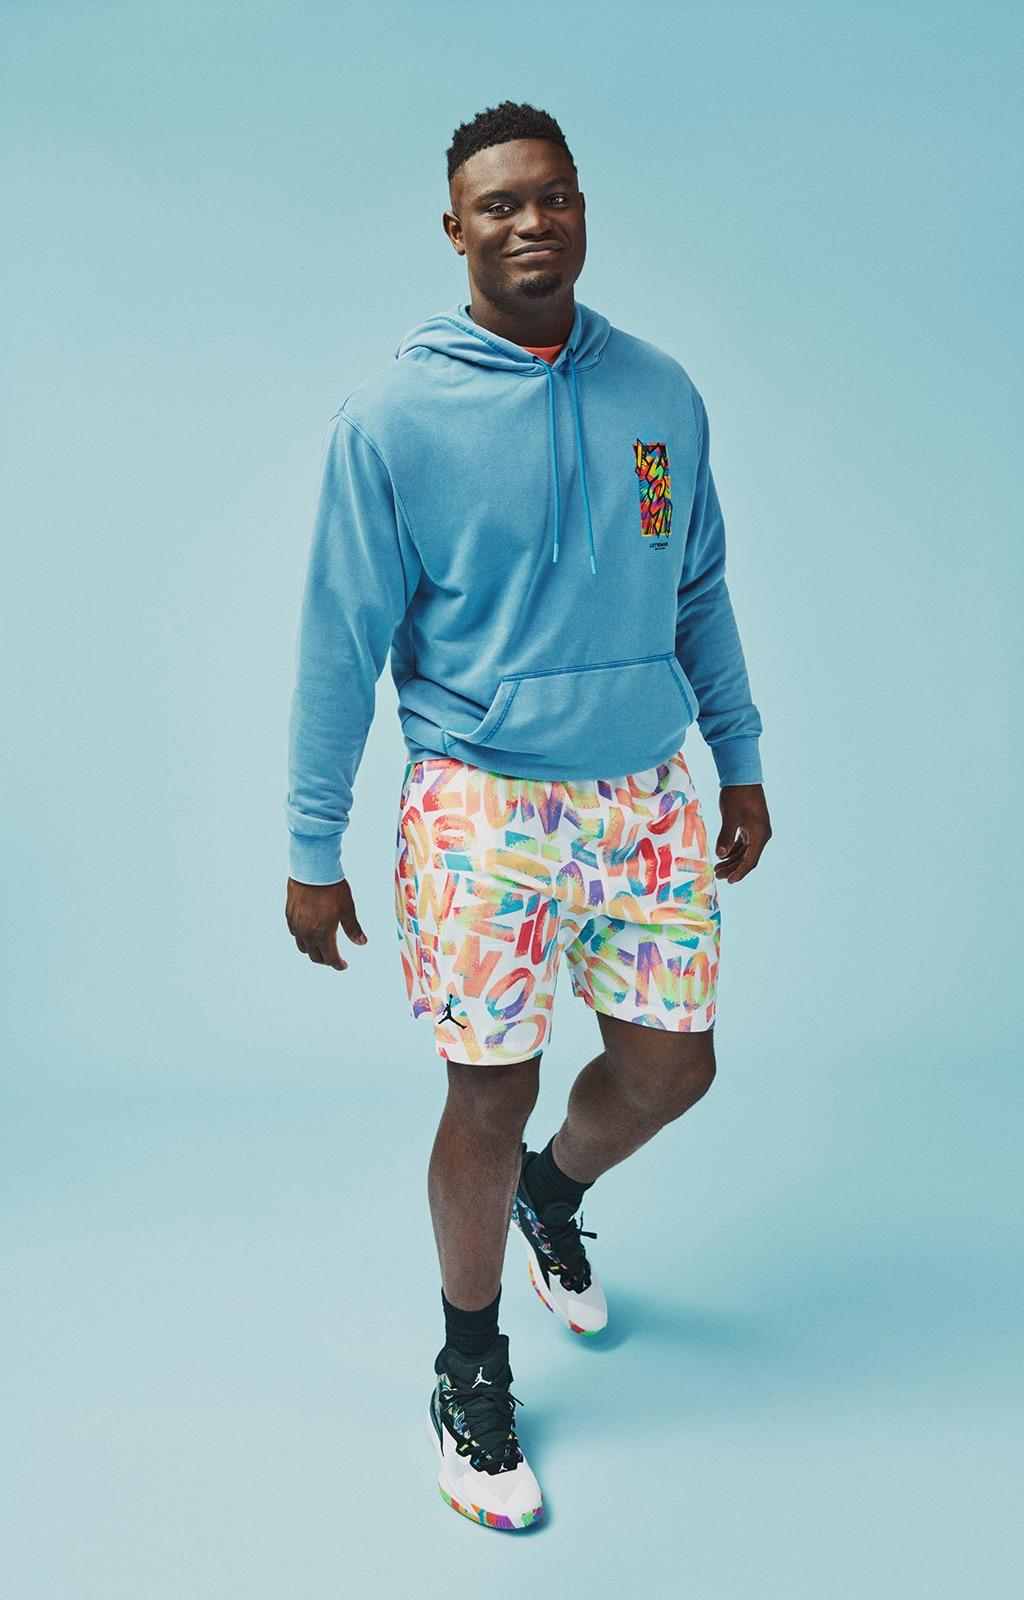 Коллекция одежды Zion x Jordan